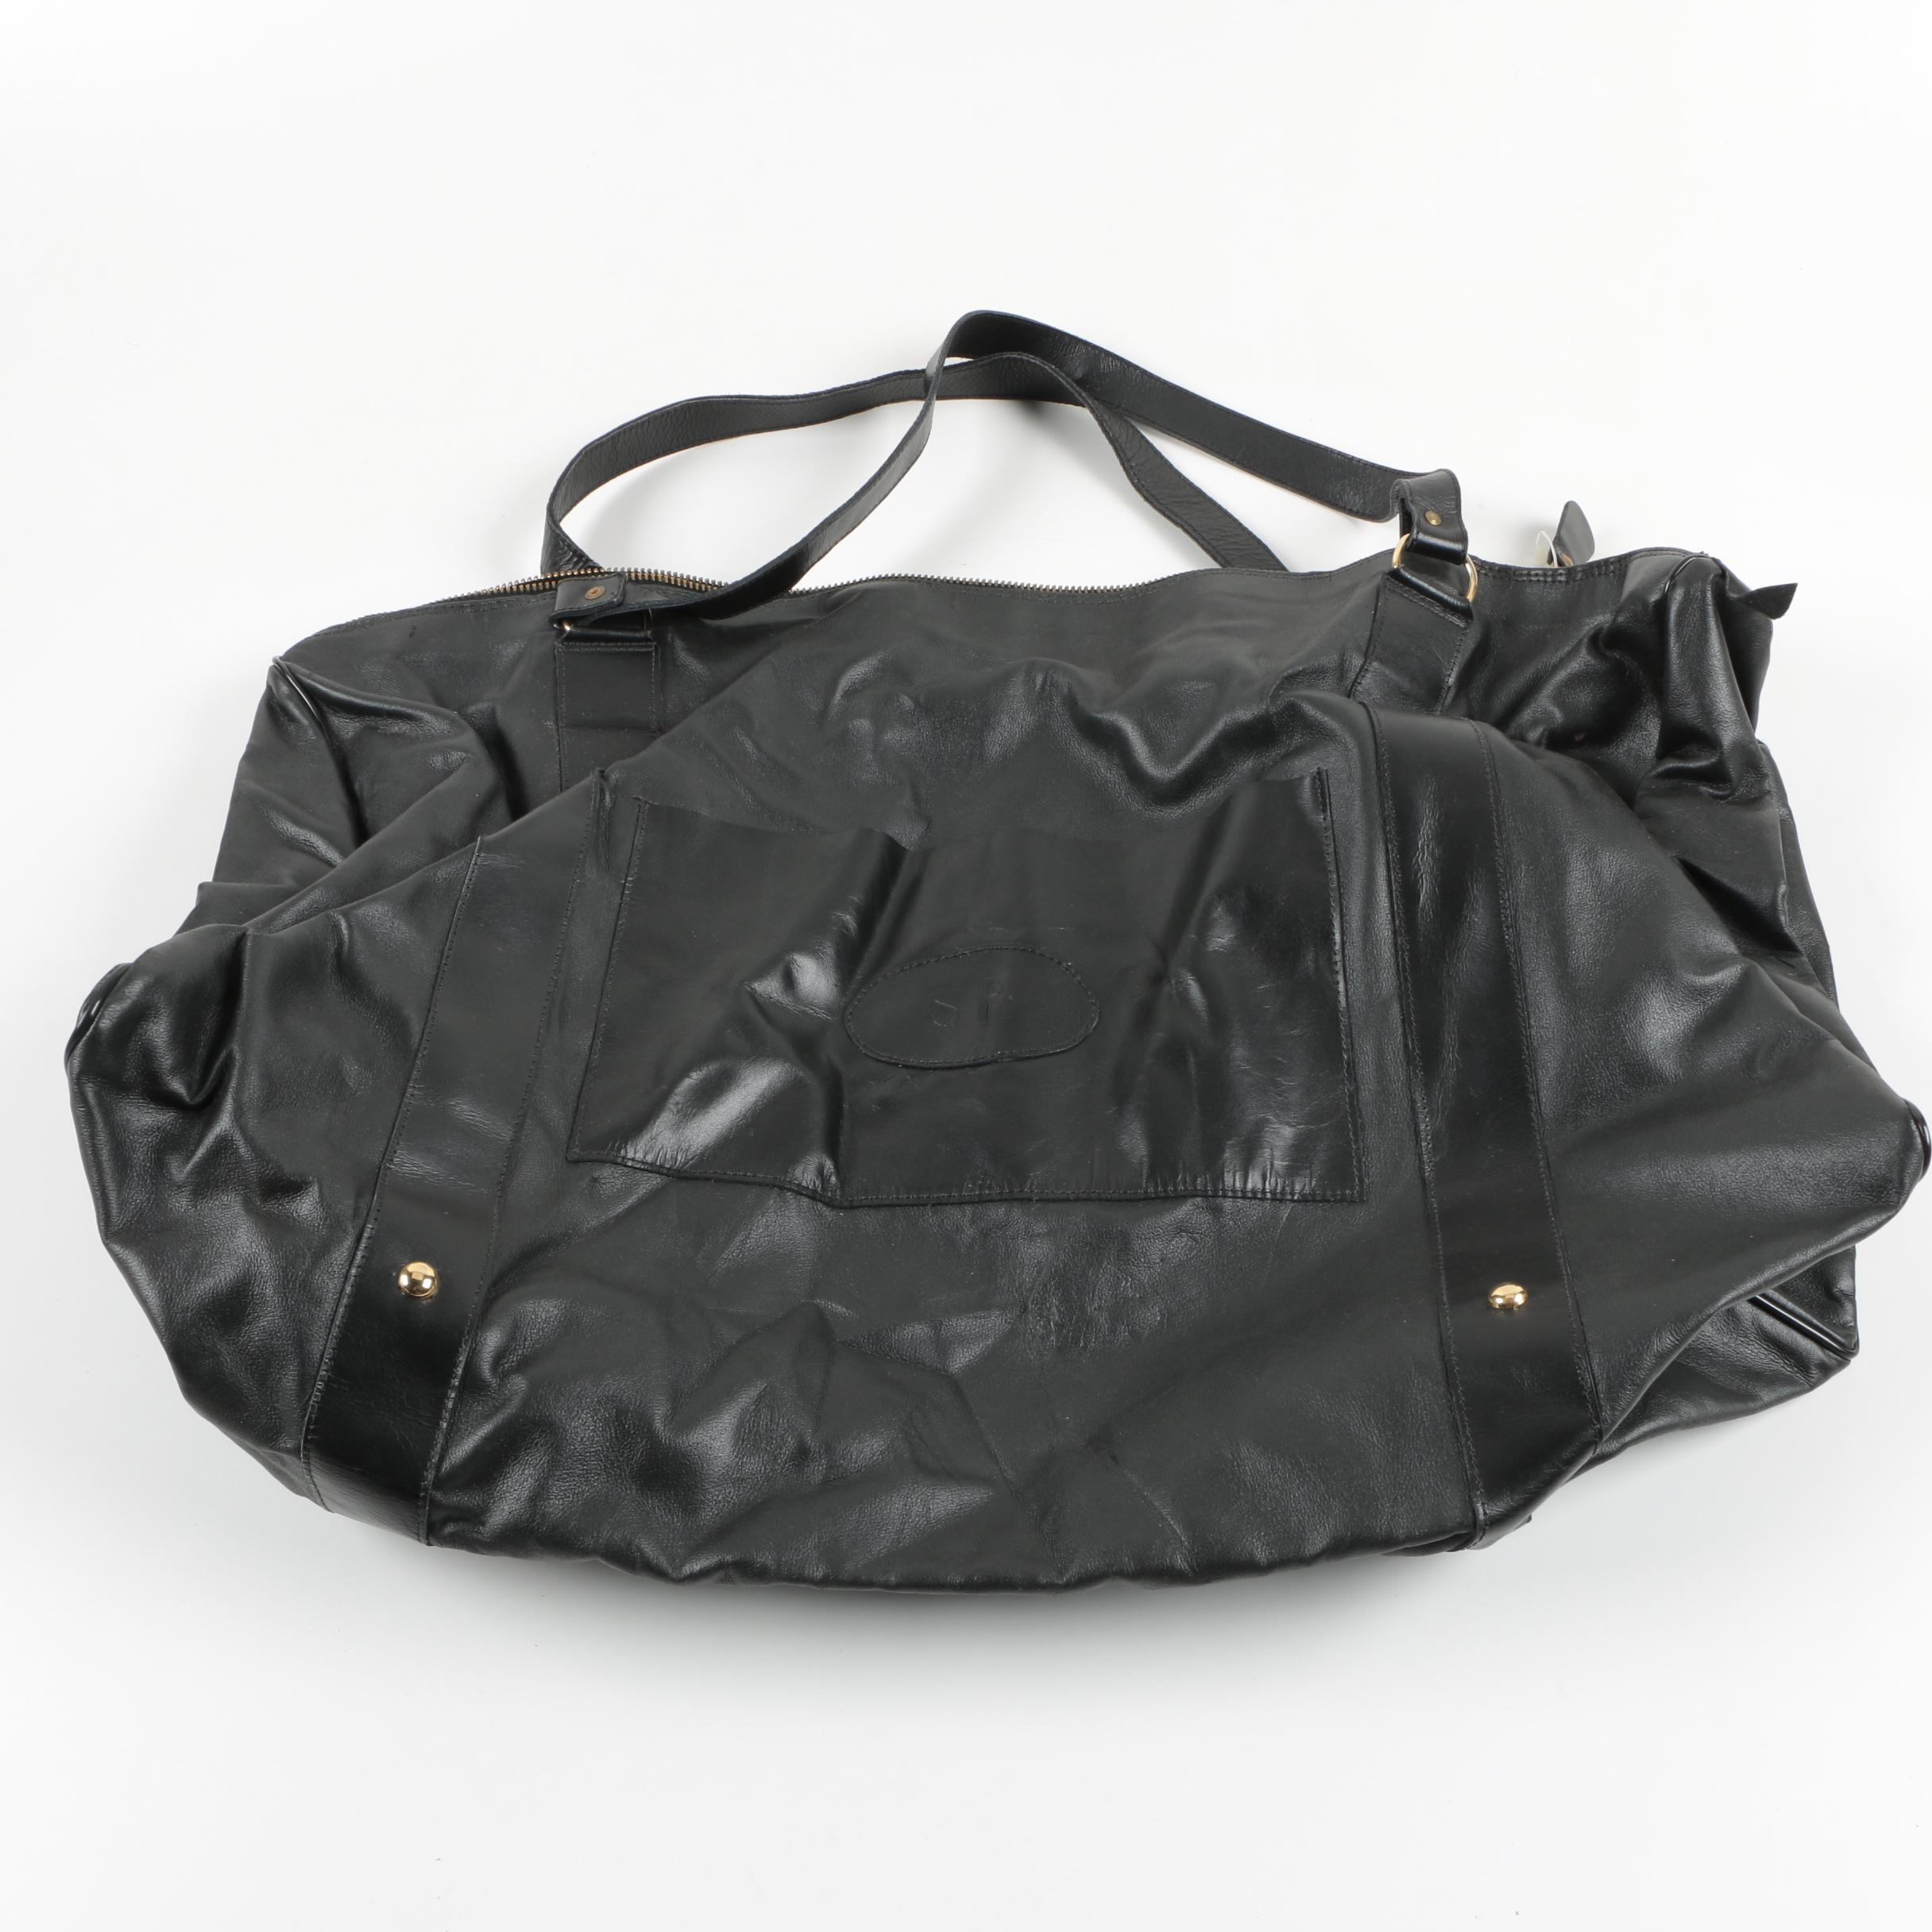 Vintage Sonia Rykiel Black Leather Tote Bag